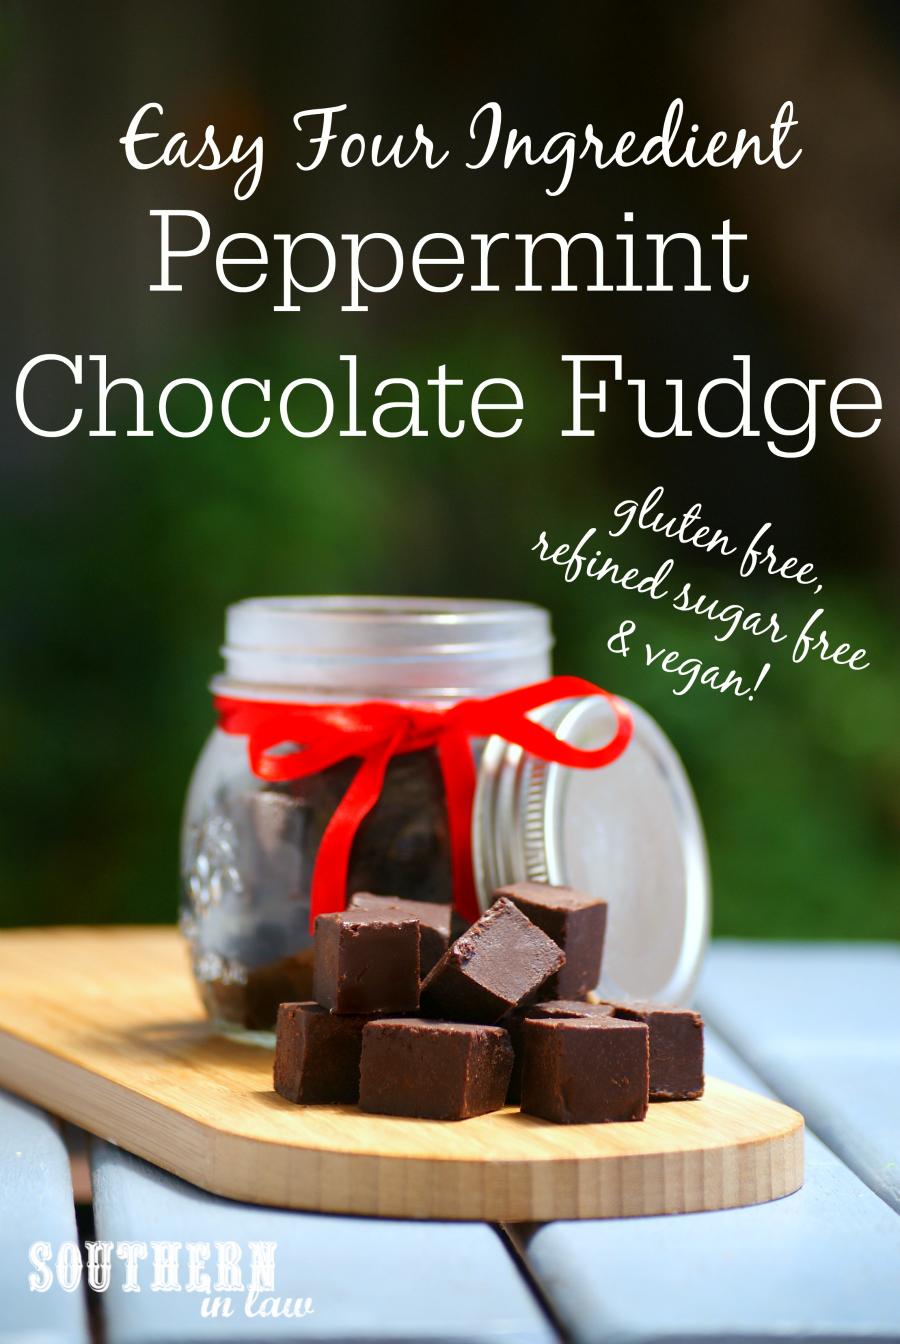 Sugar free fudge recipes for christmas